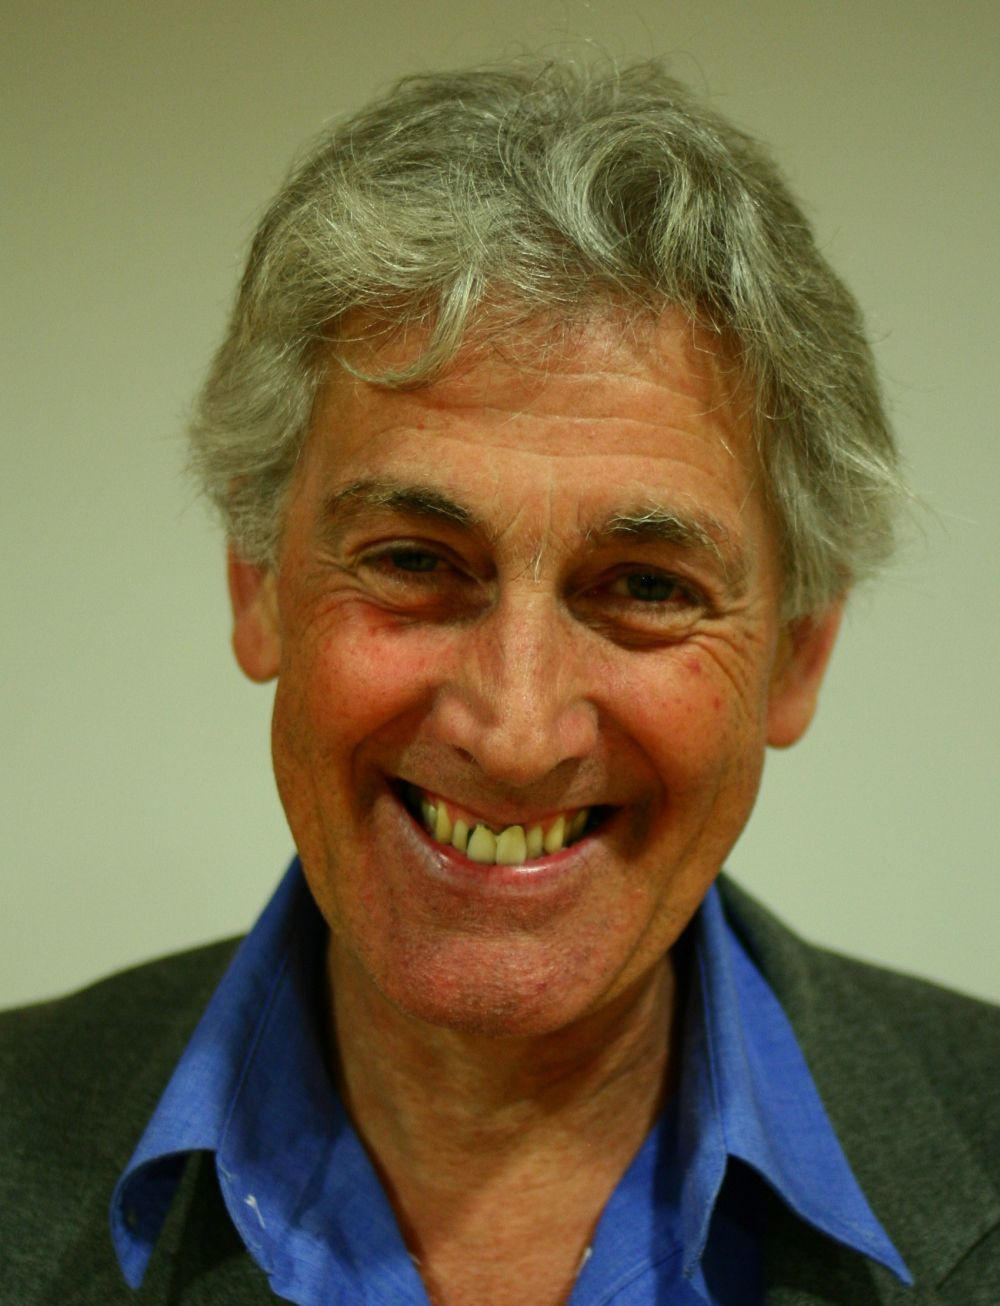 Philippe Plissot